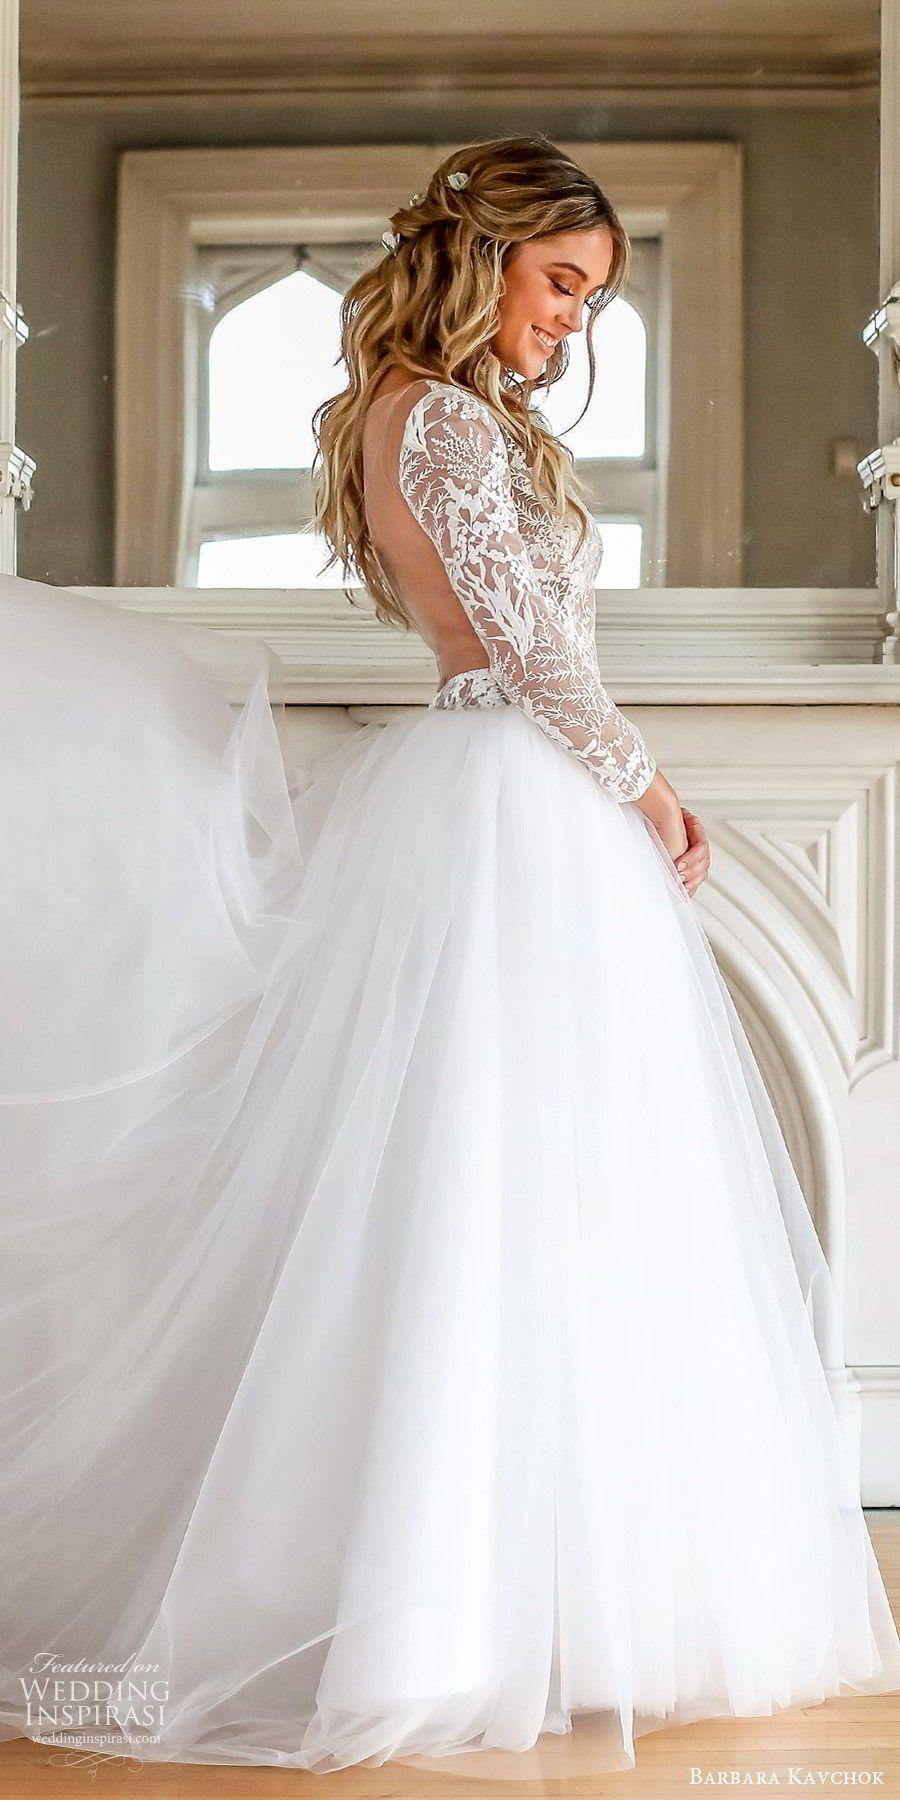 Barbara Kavchok Fall 2019 Wedding Dresses Wedding Inspirasi Lace Wedding Dress With Sleeves Ball Gown Wedding Dress Long Sleeve Wedding Dress Lace [ 1800 x 900 Pixel ]